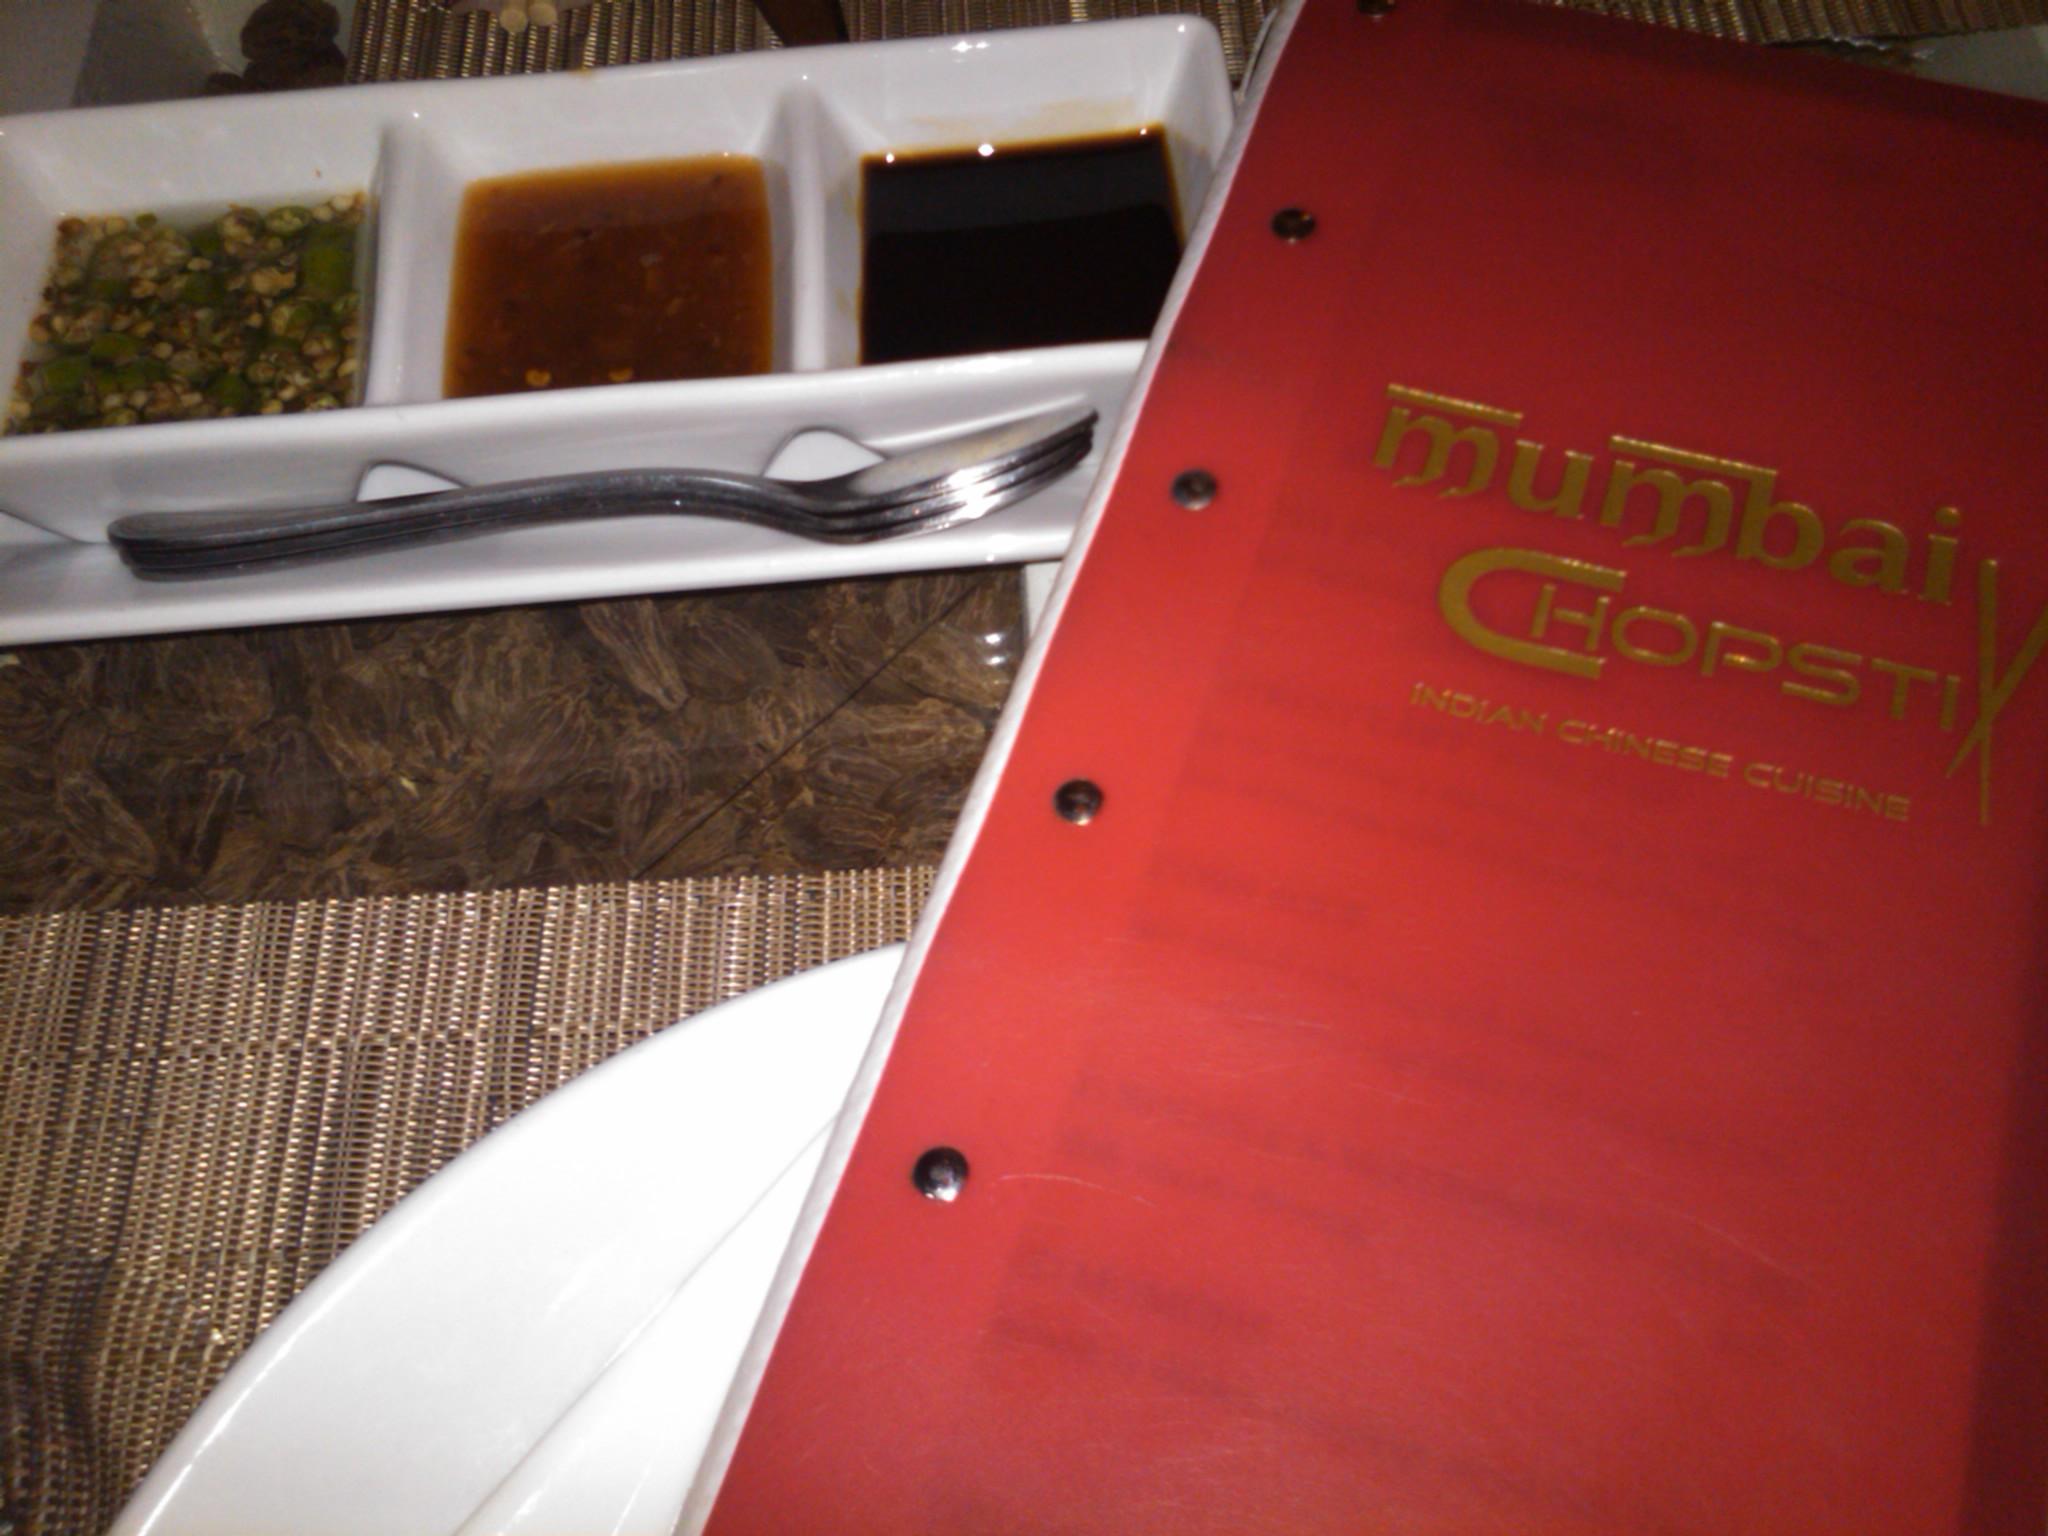 While Mumbai Chopstix wasn't a vegan restaurant, they had tons of delicious vegan options!